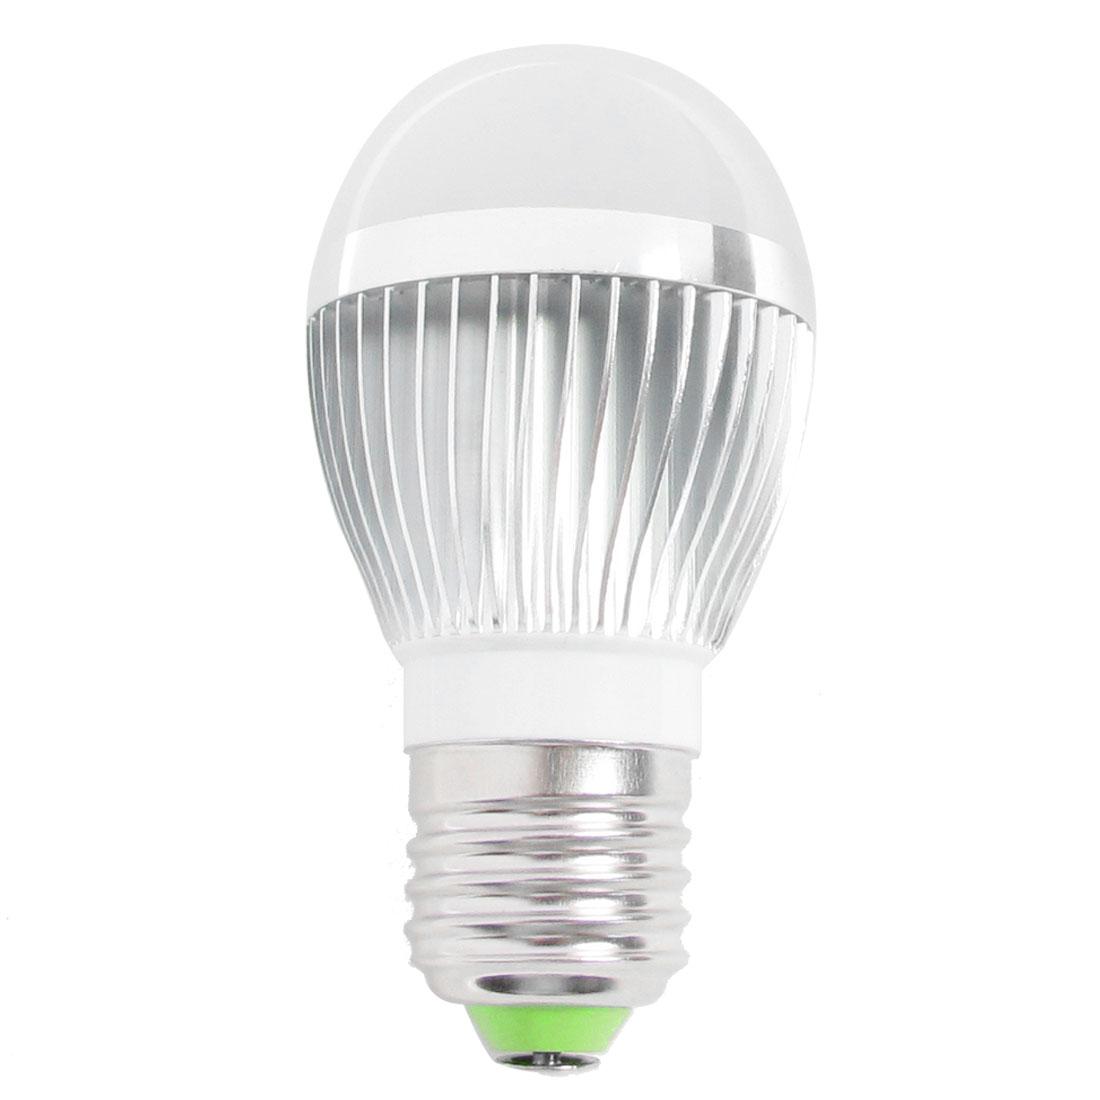 Aluminum Alloy E27 3W 3 SMD LED Globe Ball Light Lamp Warm White AC 220V